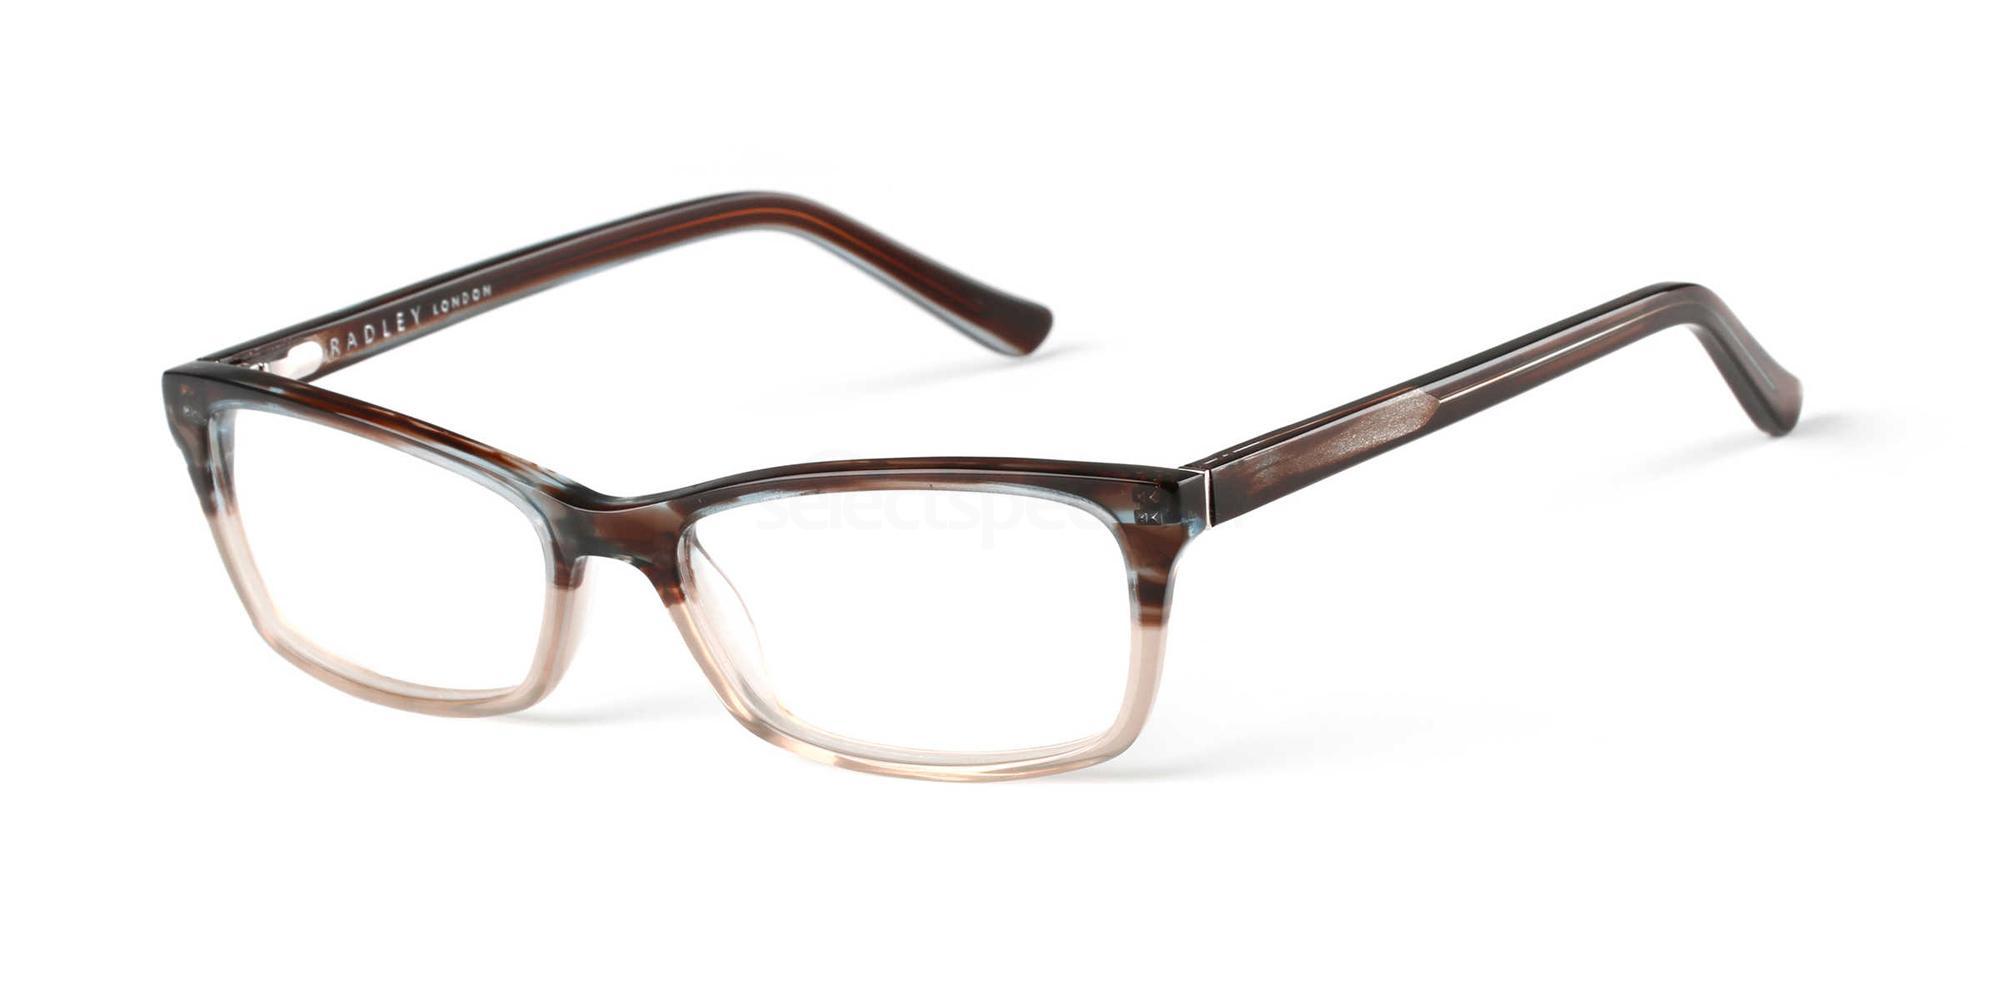 107 RDO-15514 Glasses, Radley London